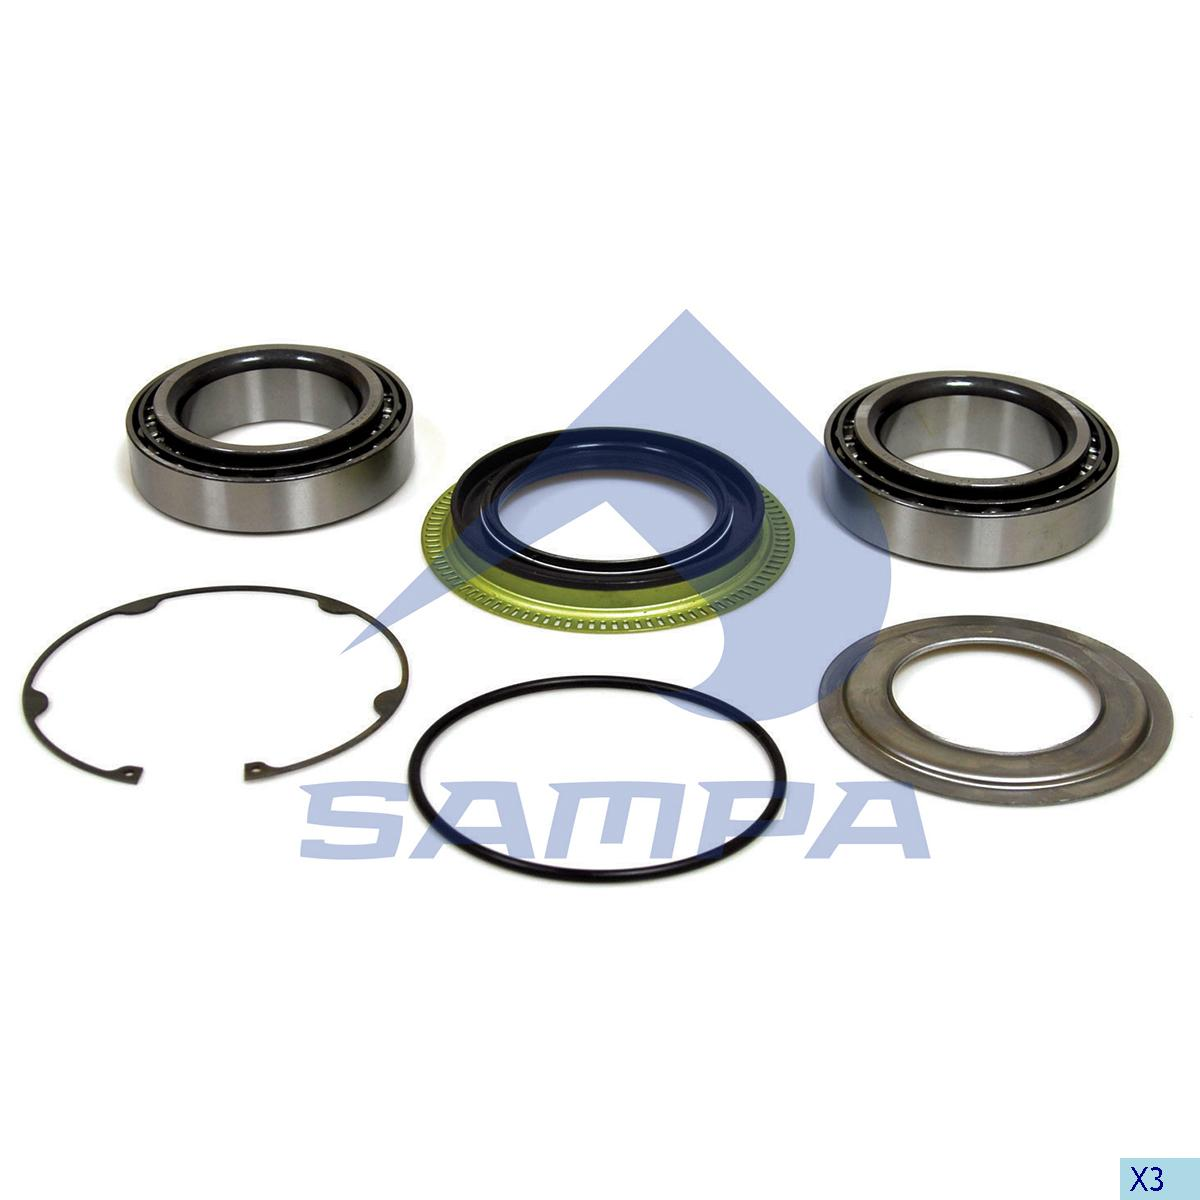 Repair Kit, Wheel Hub, SMB, Power Unit